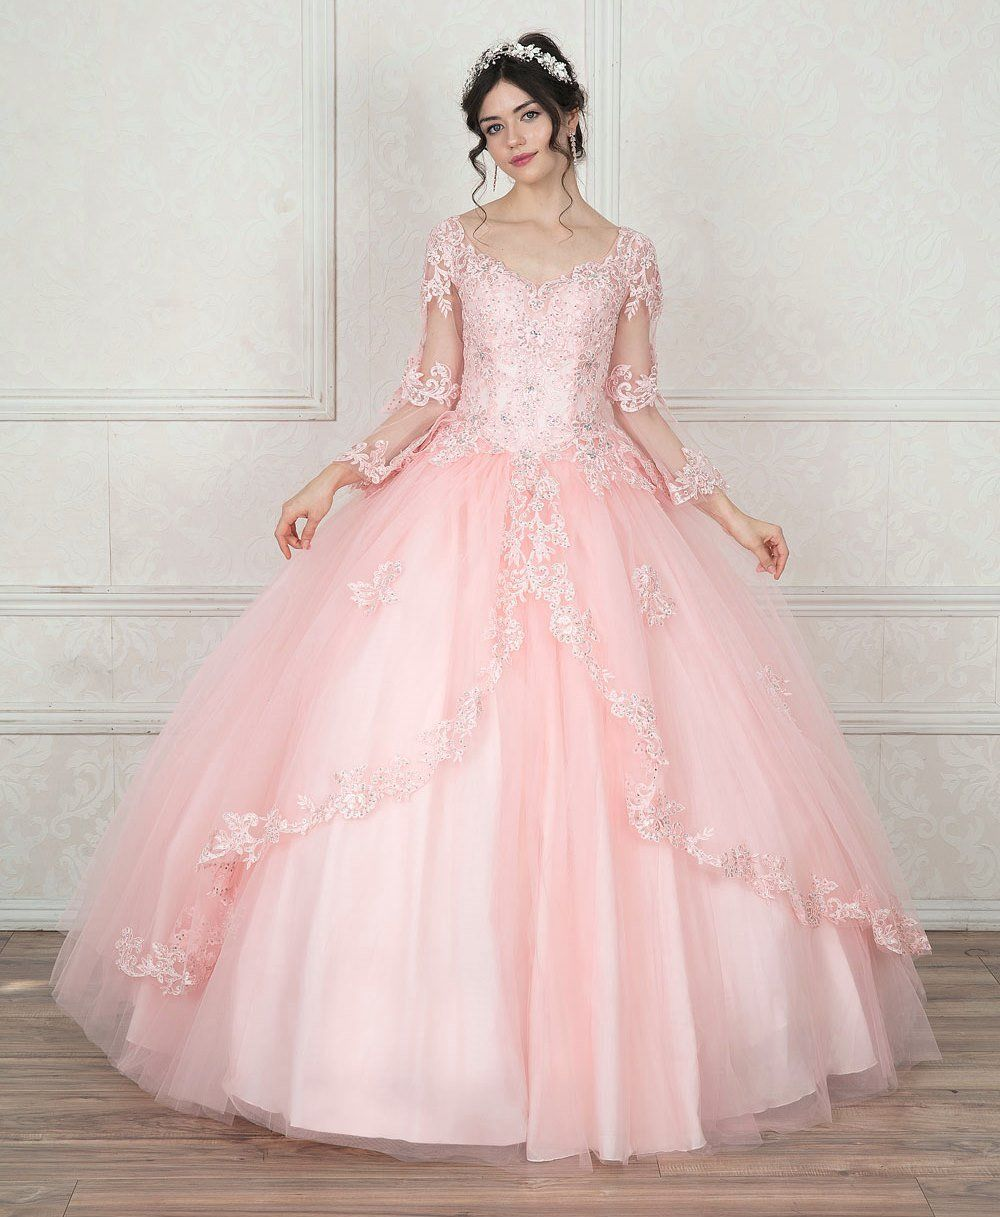 Asombroso Vestidos De Fiesta Winston Salem Nc Ideas Ornamento ...